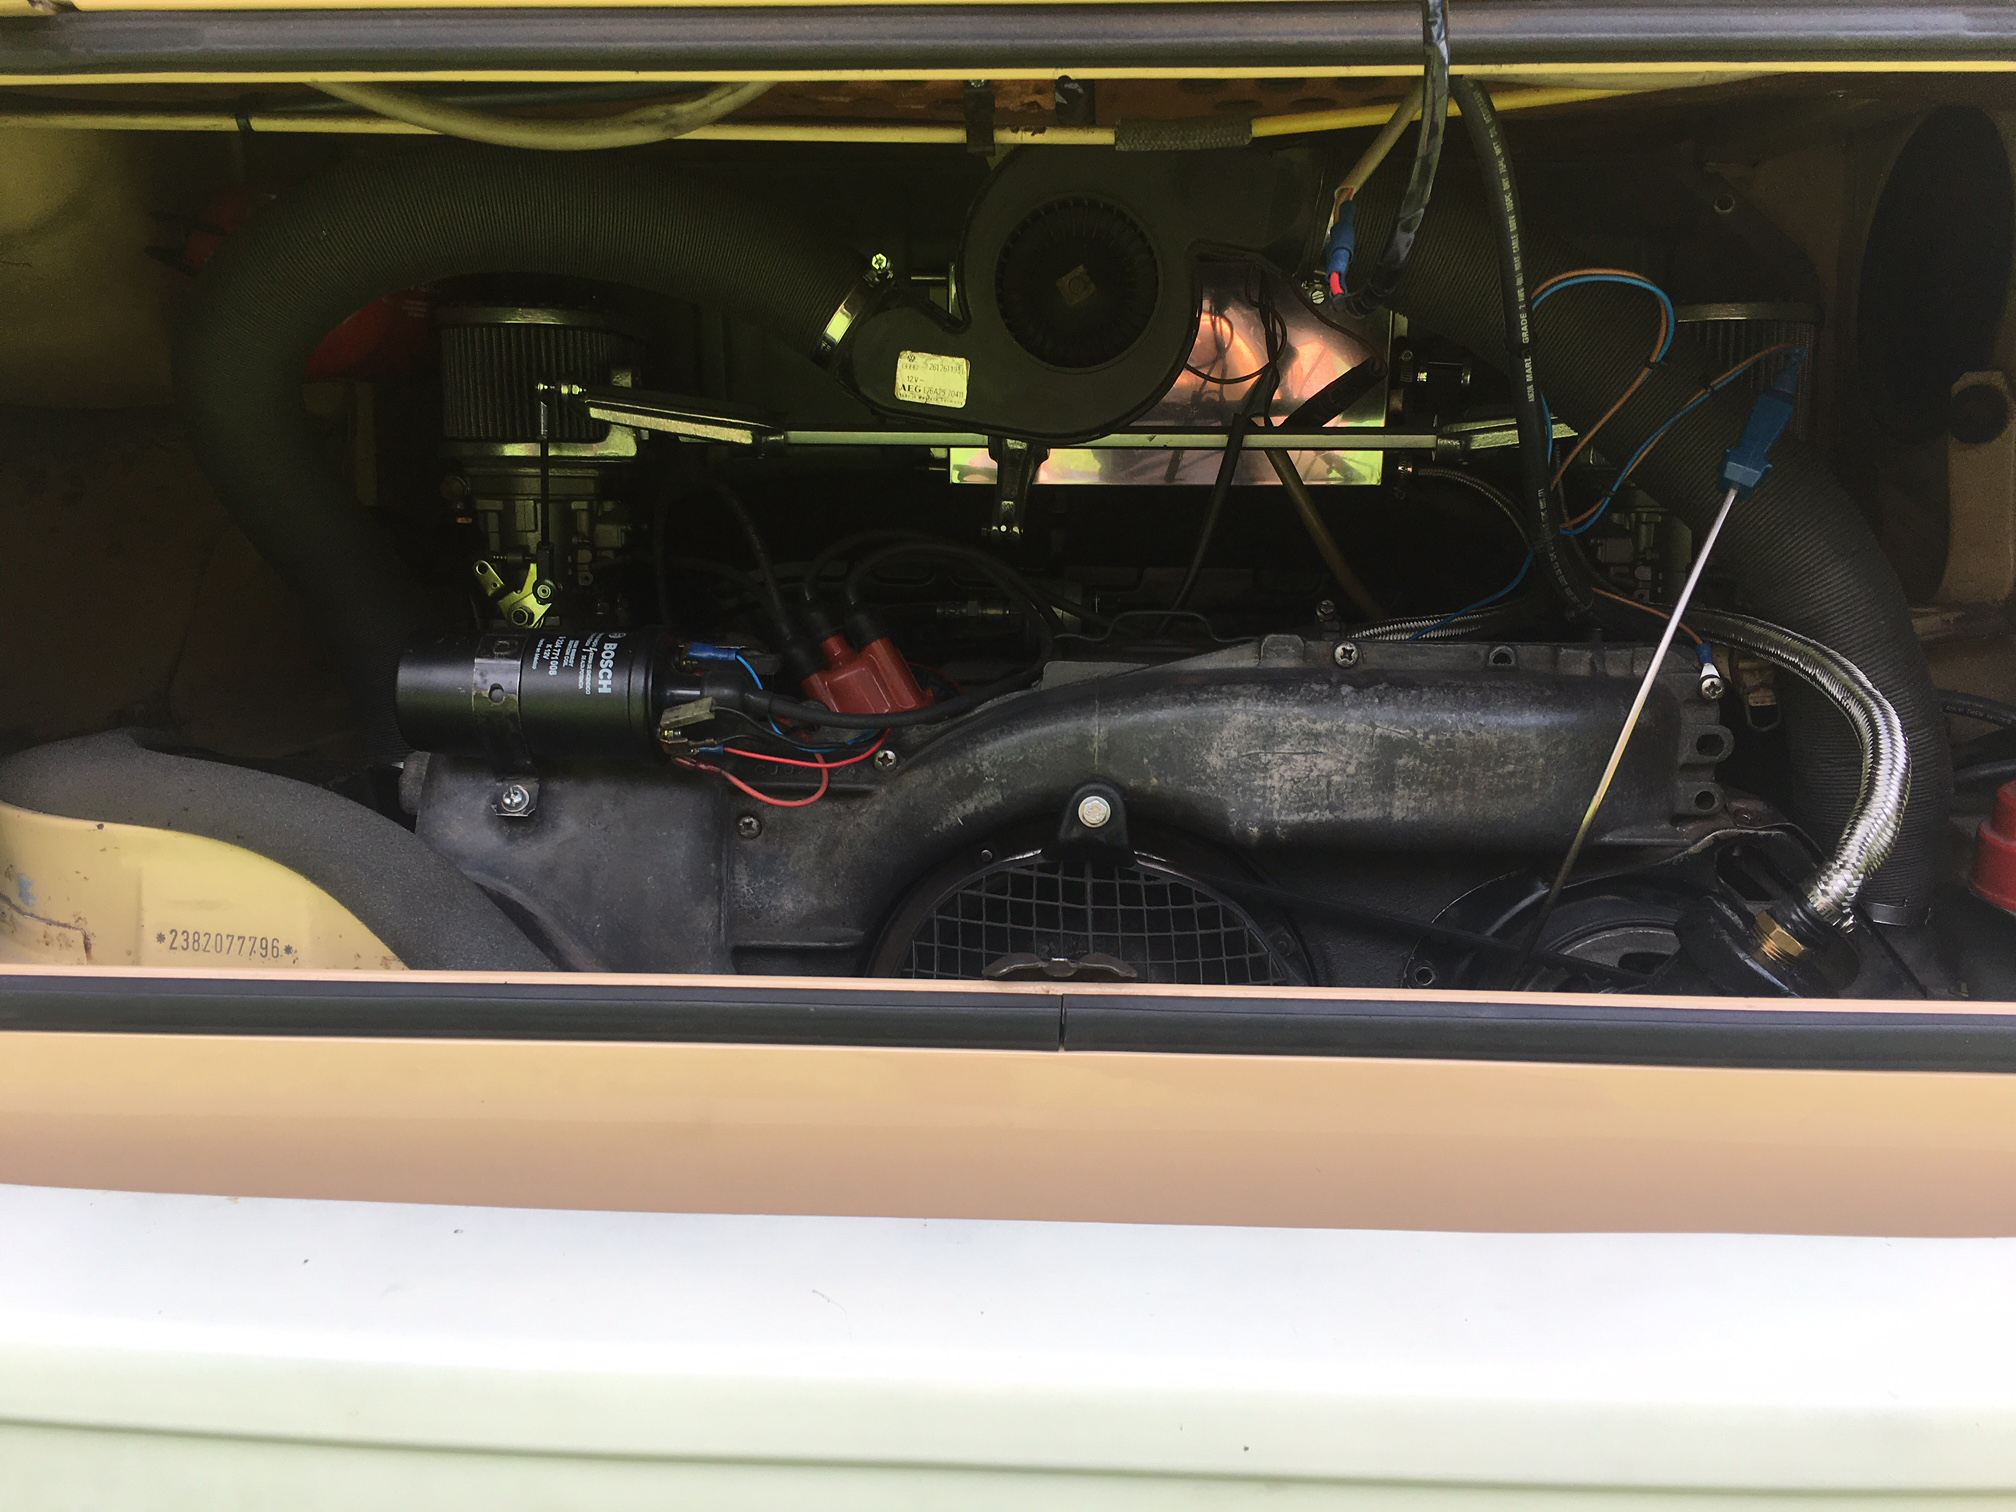 1978-Westfalia-Camper-Van-Engine